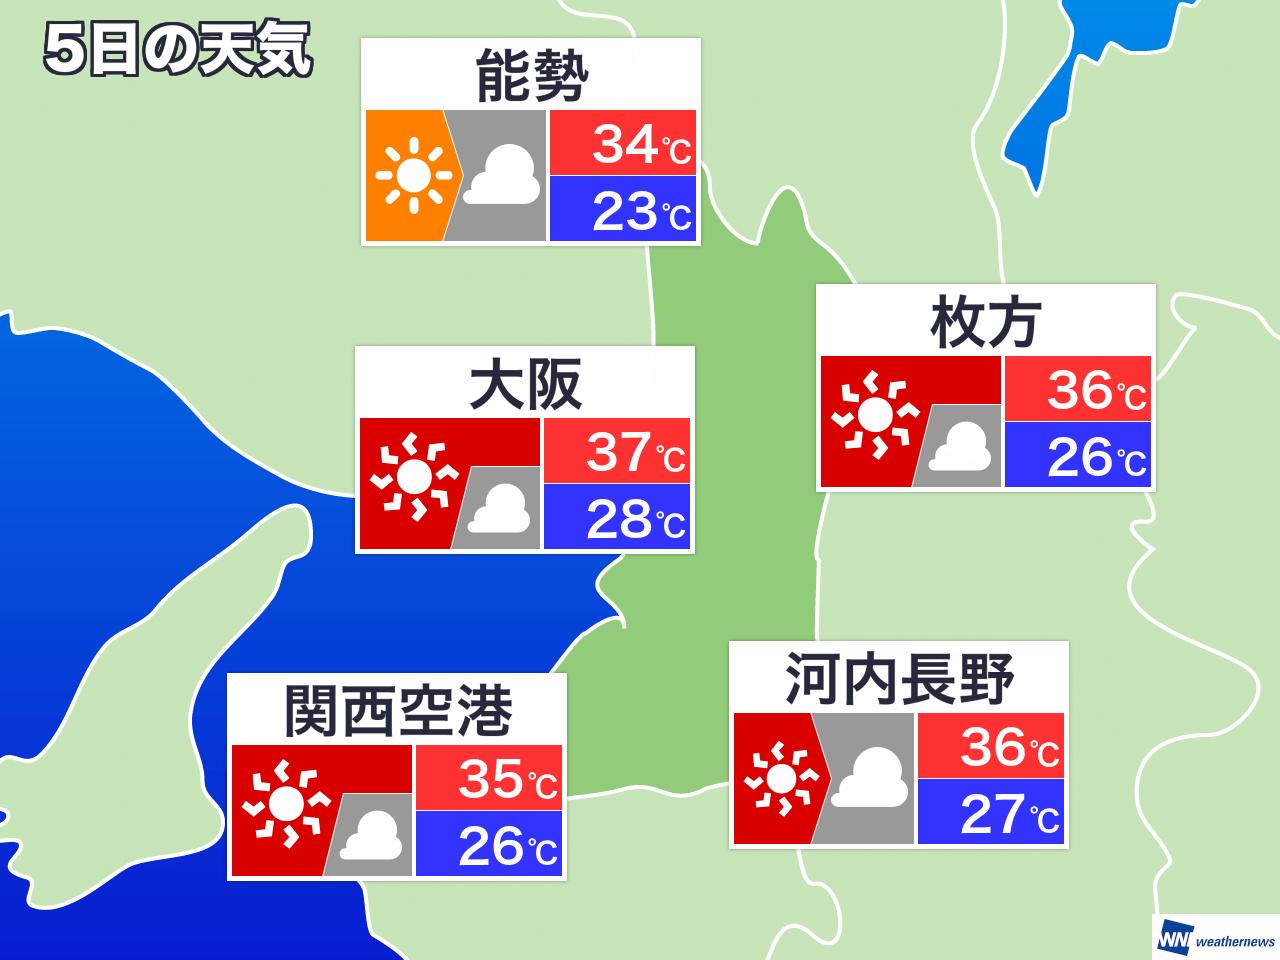 明日 の 天気 和歌山 和歌山市の今日明日の天気 - 日本気象協会